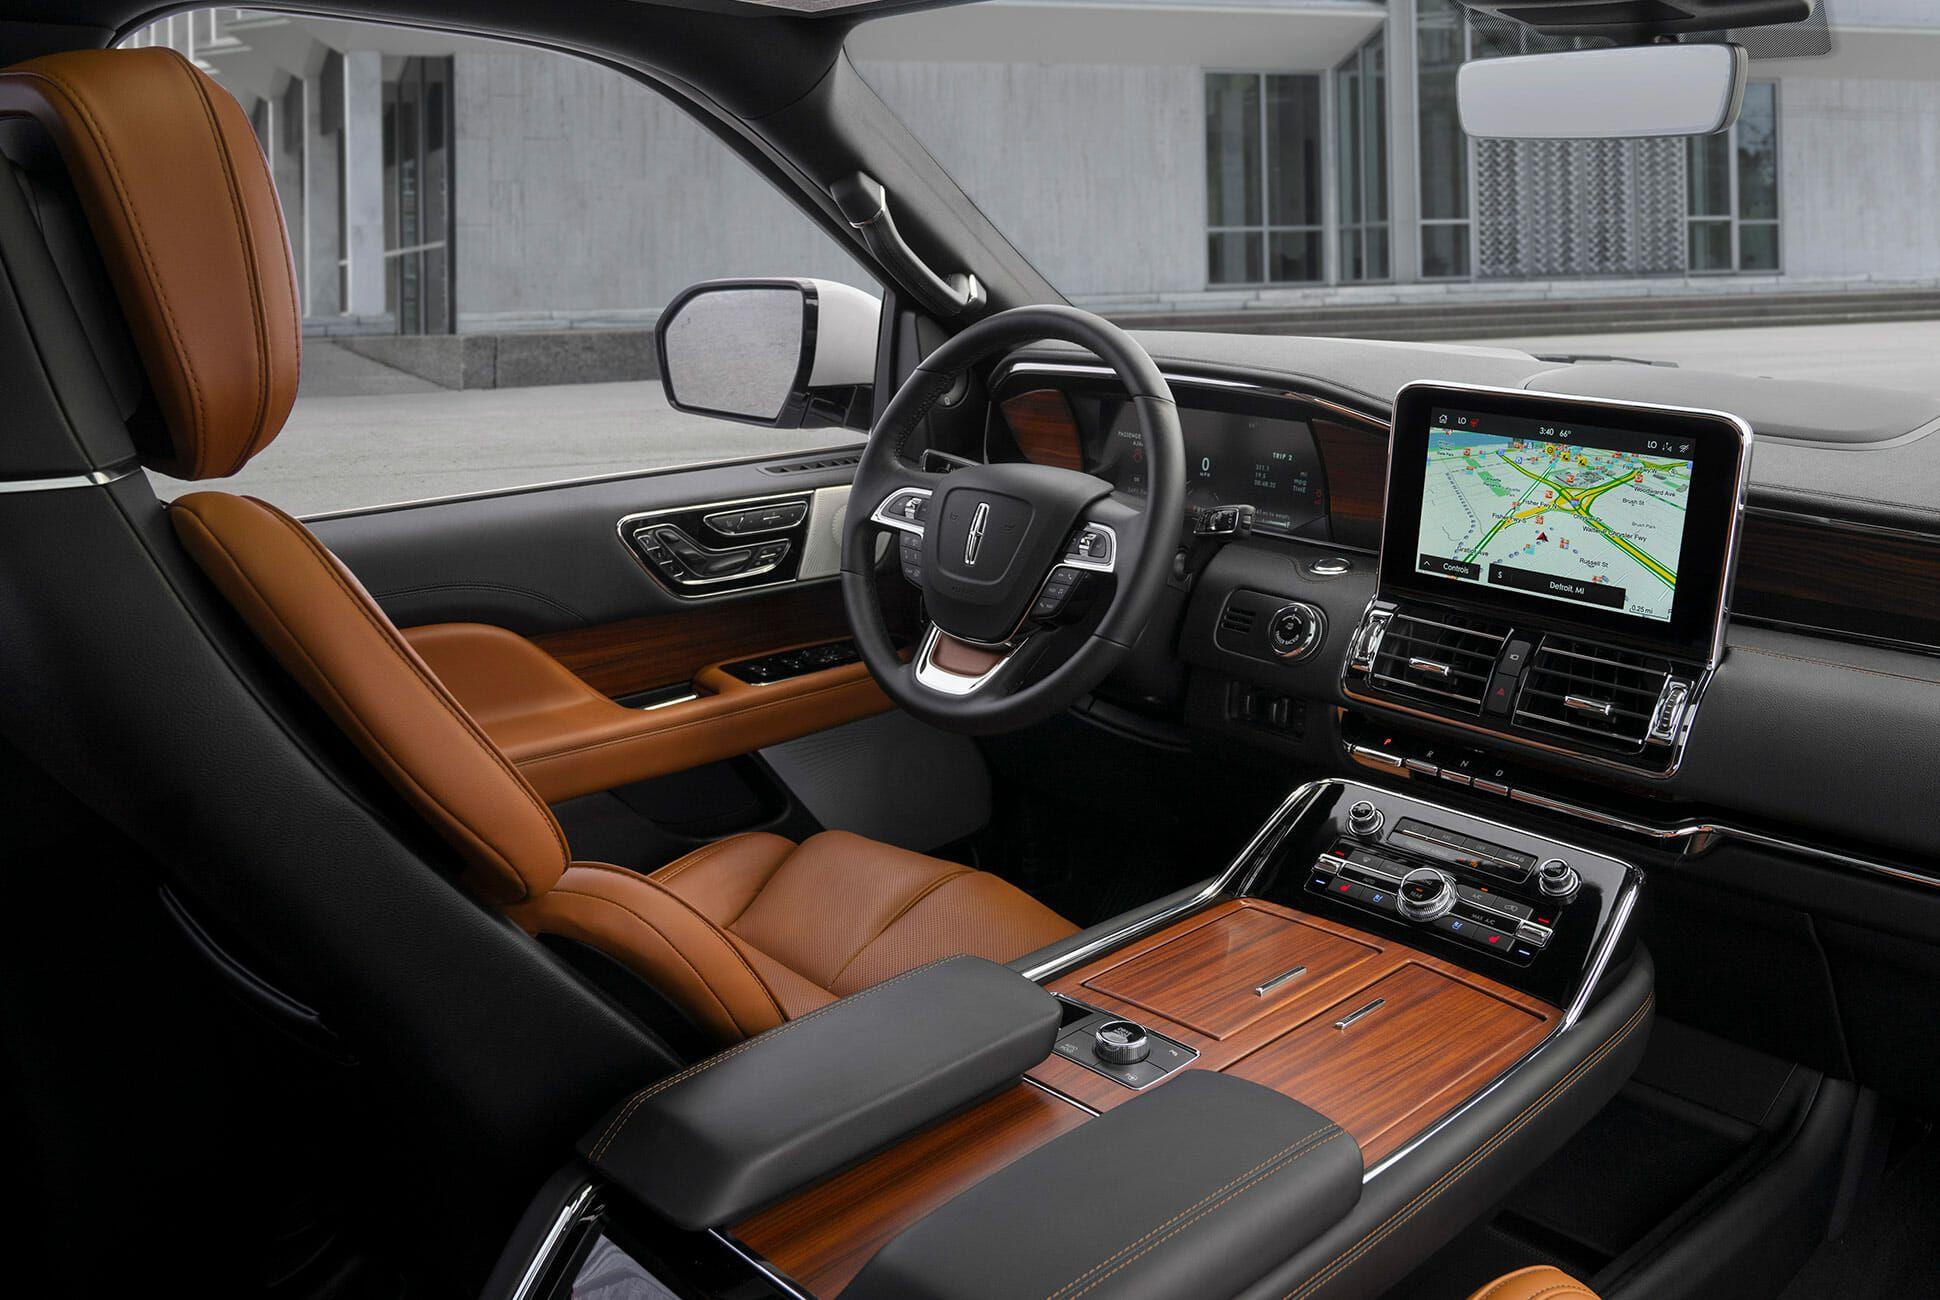 2020-Lincoln-Navigator-Monochromatic-Package-gear-patrol-slide-5